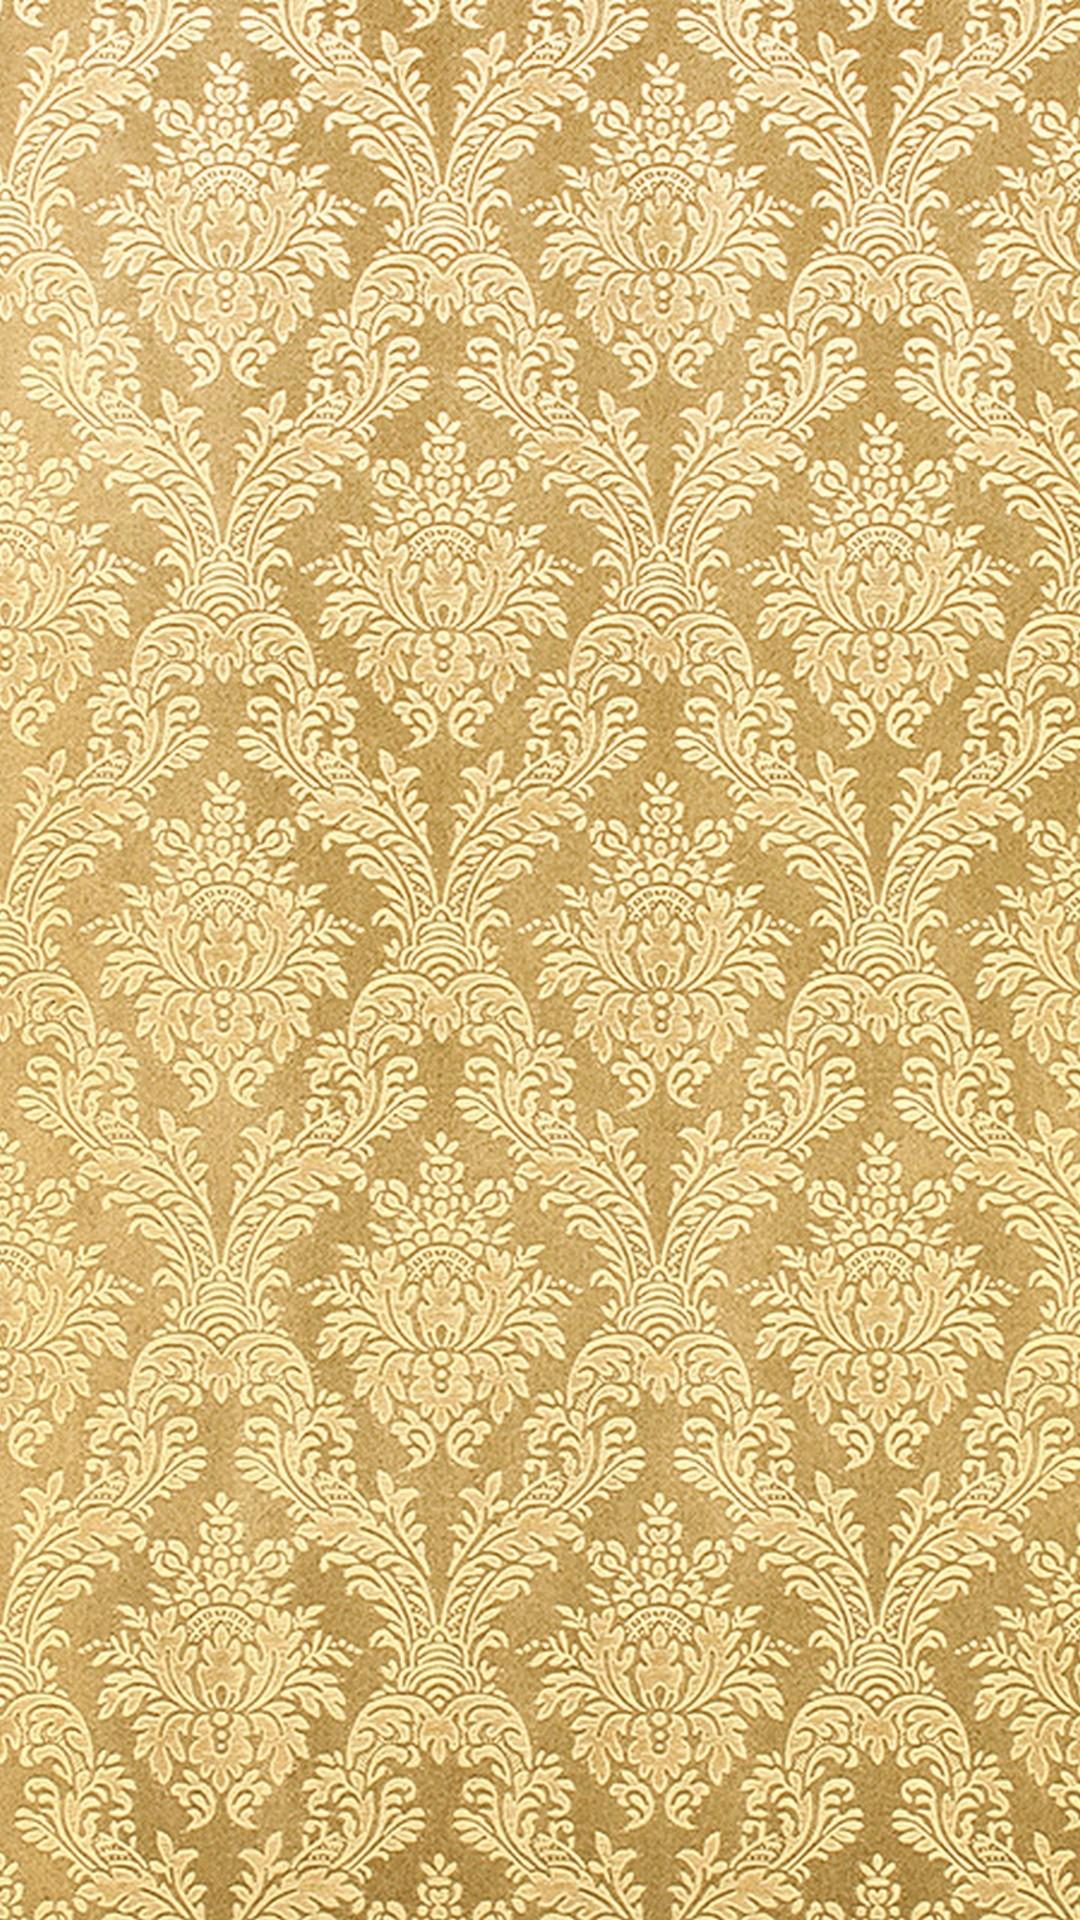 Gold hd wallpaper